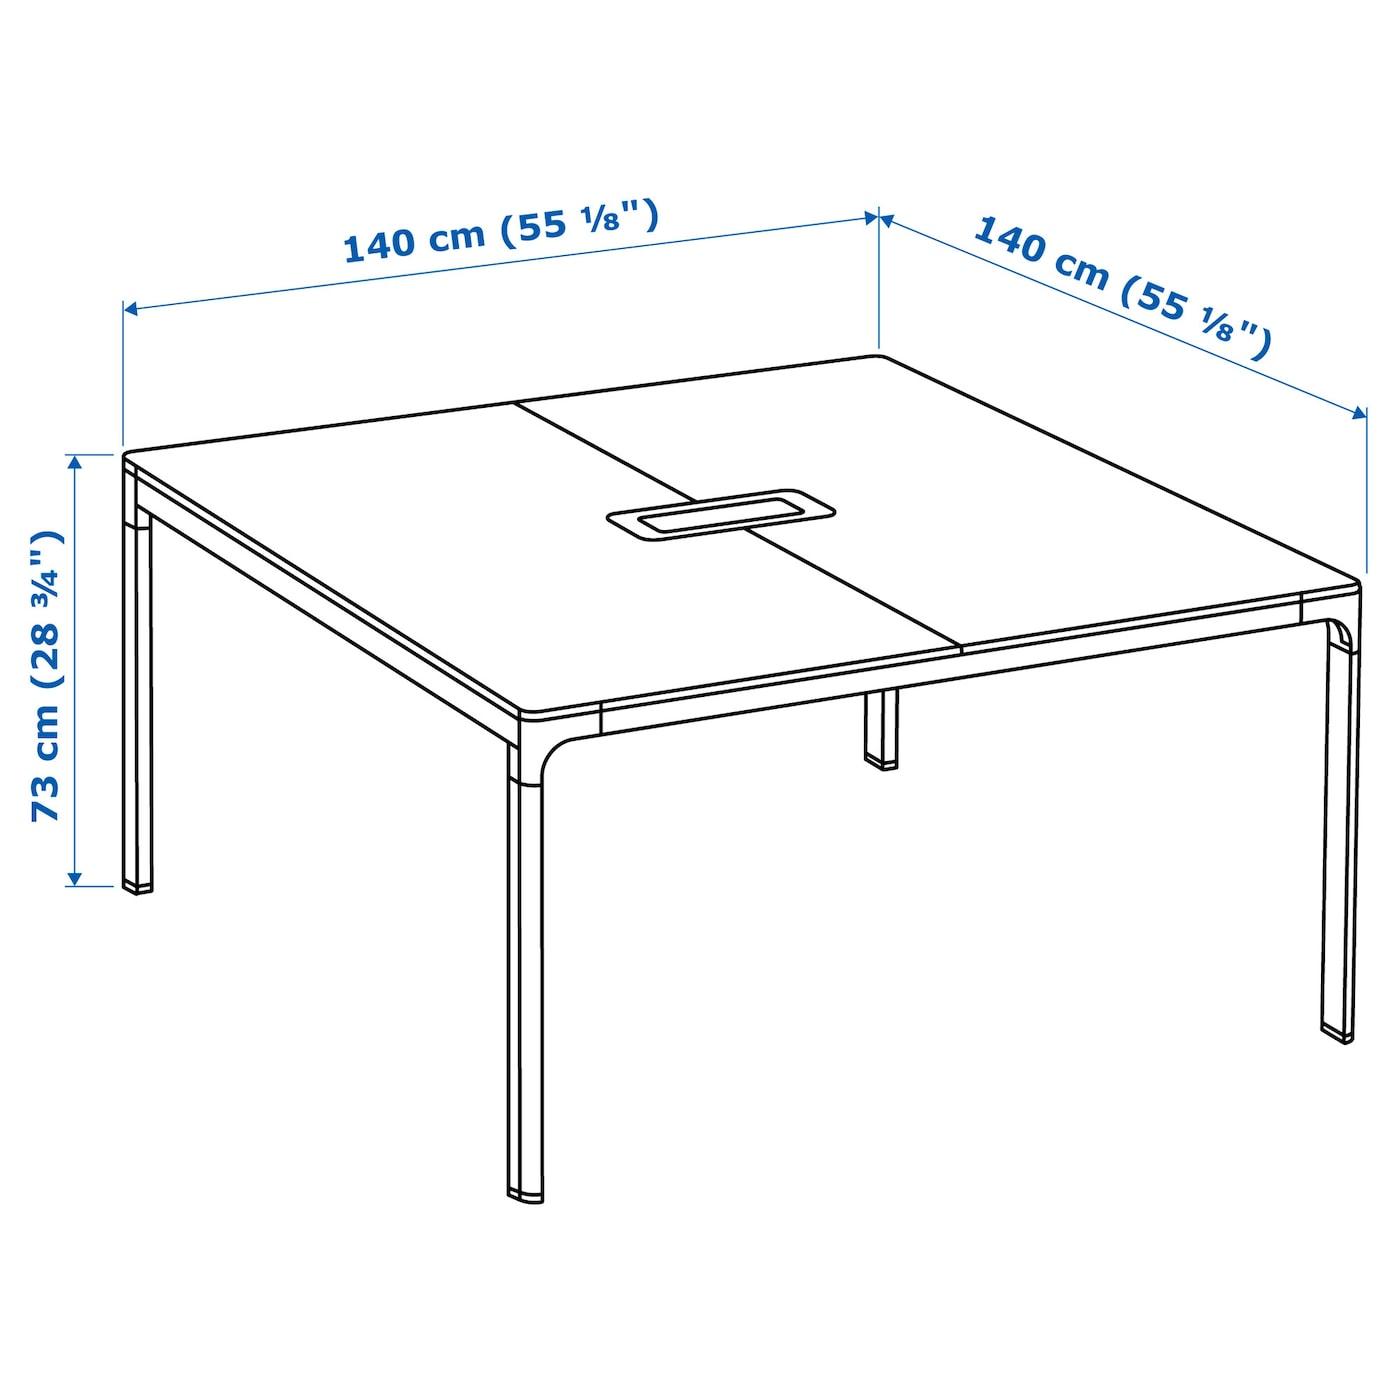 Konferenztisch Ikea bekant conference table black brown black 140x140 cm ikea